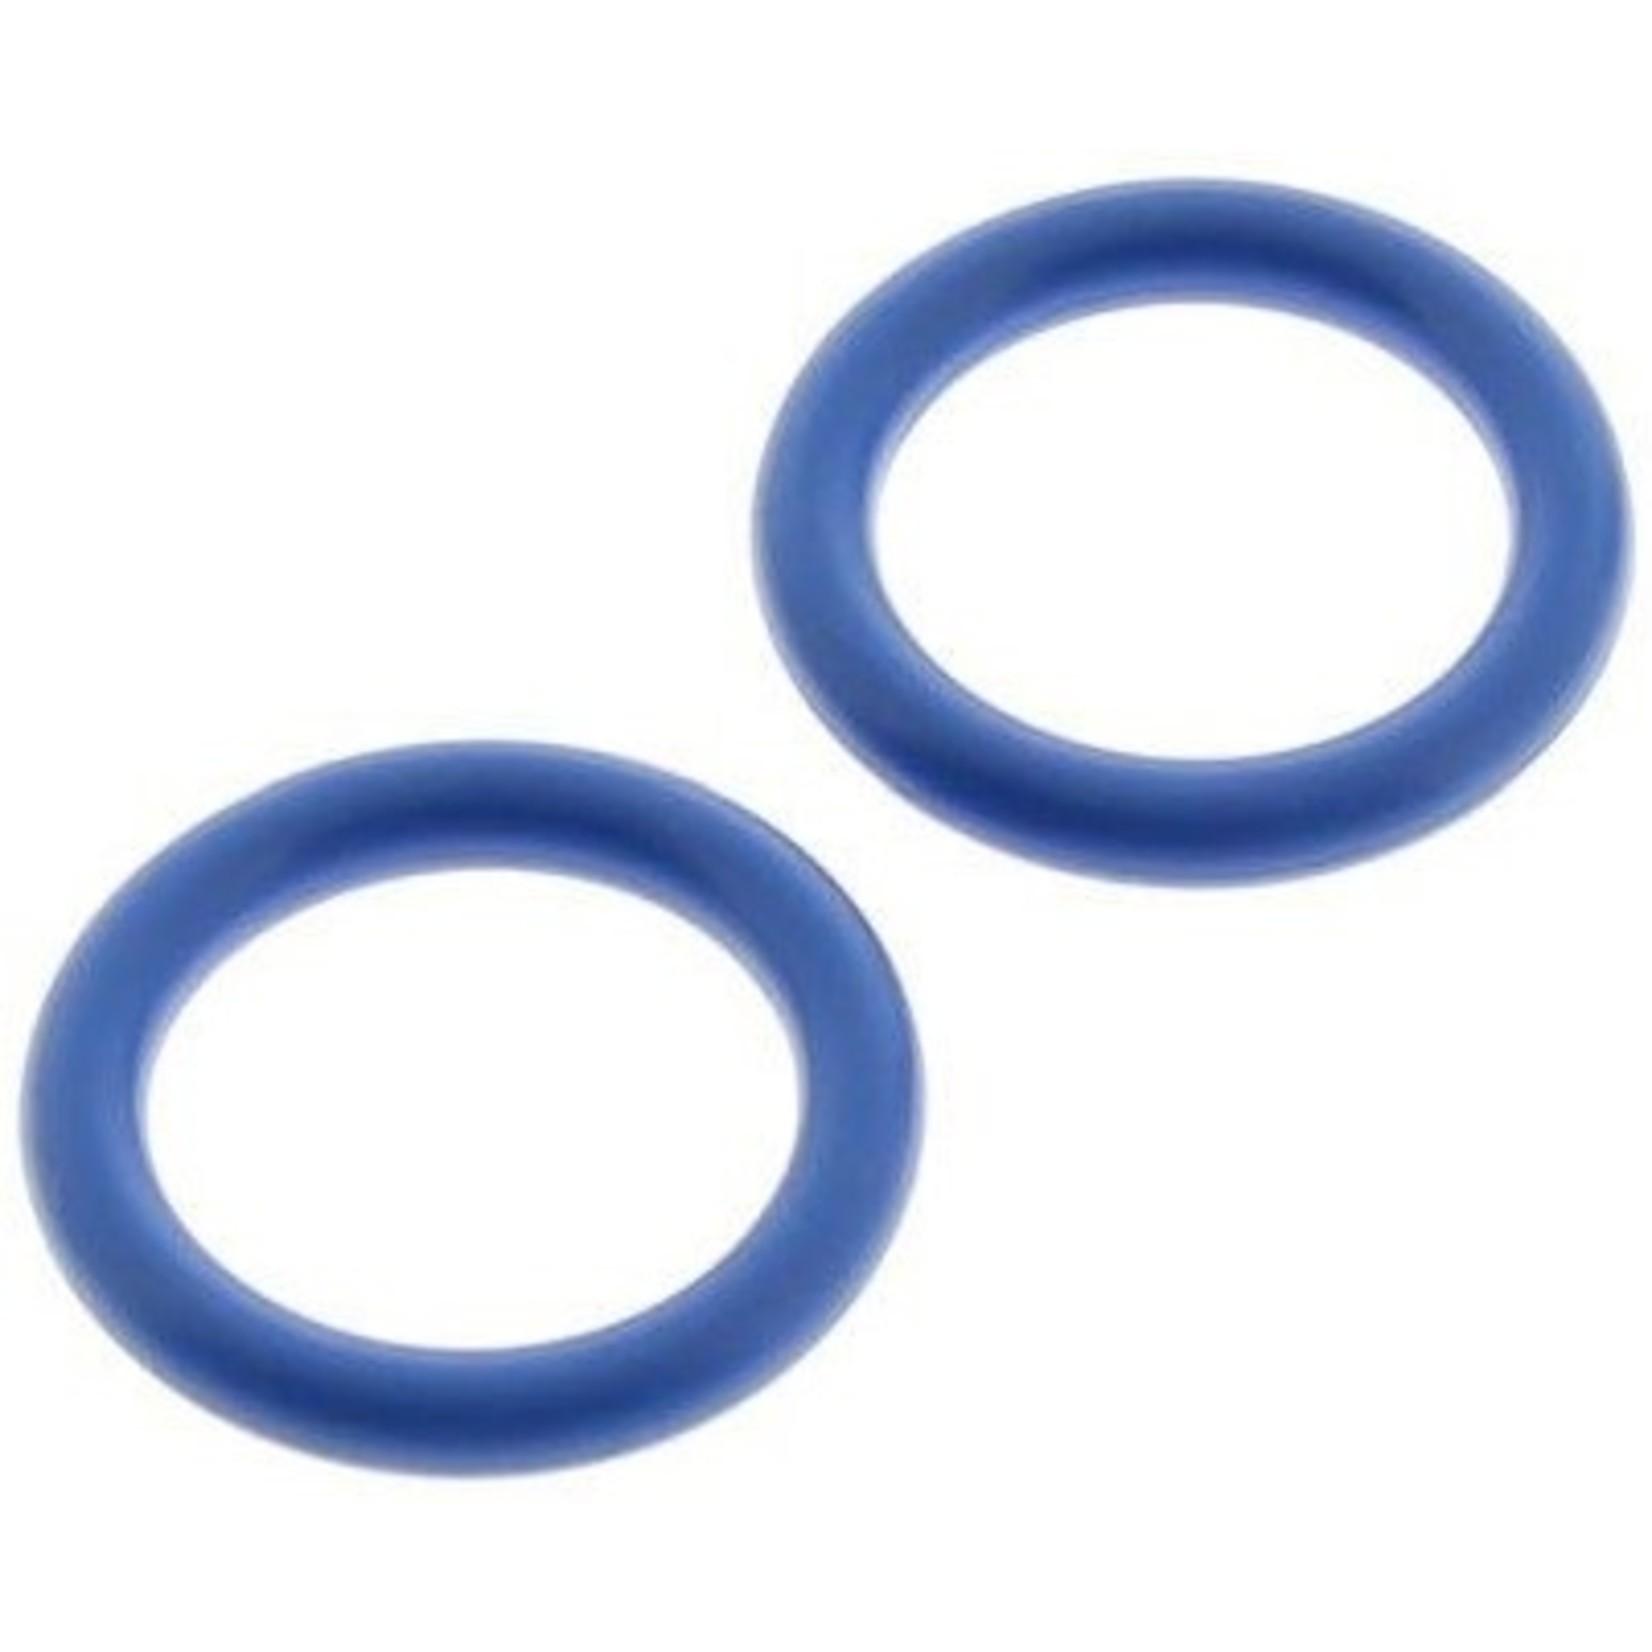 Shearwater Perdix battery cover O-rings (pair)